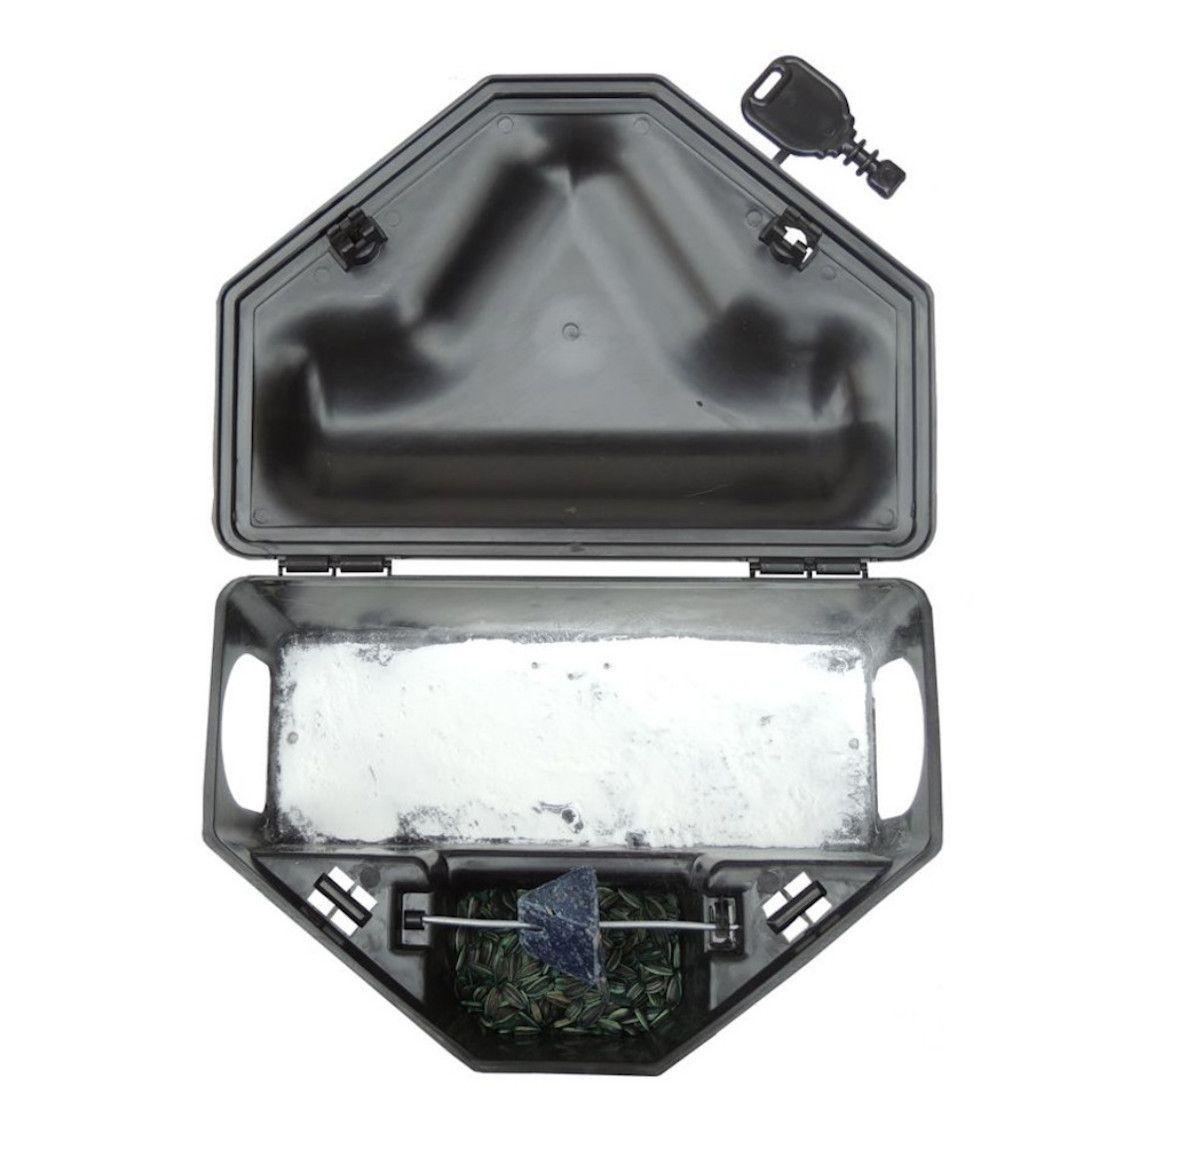 Kit 13 Porta Isca Com 2 Chaves - Duplo Travamento